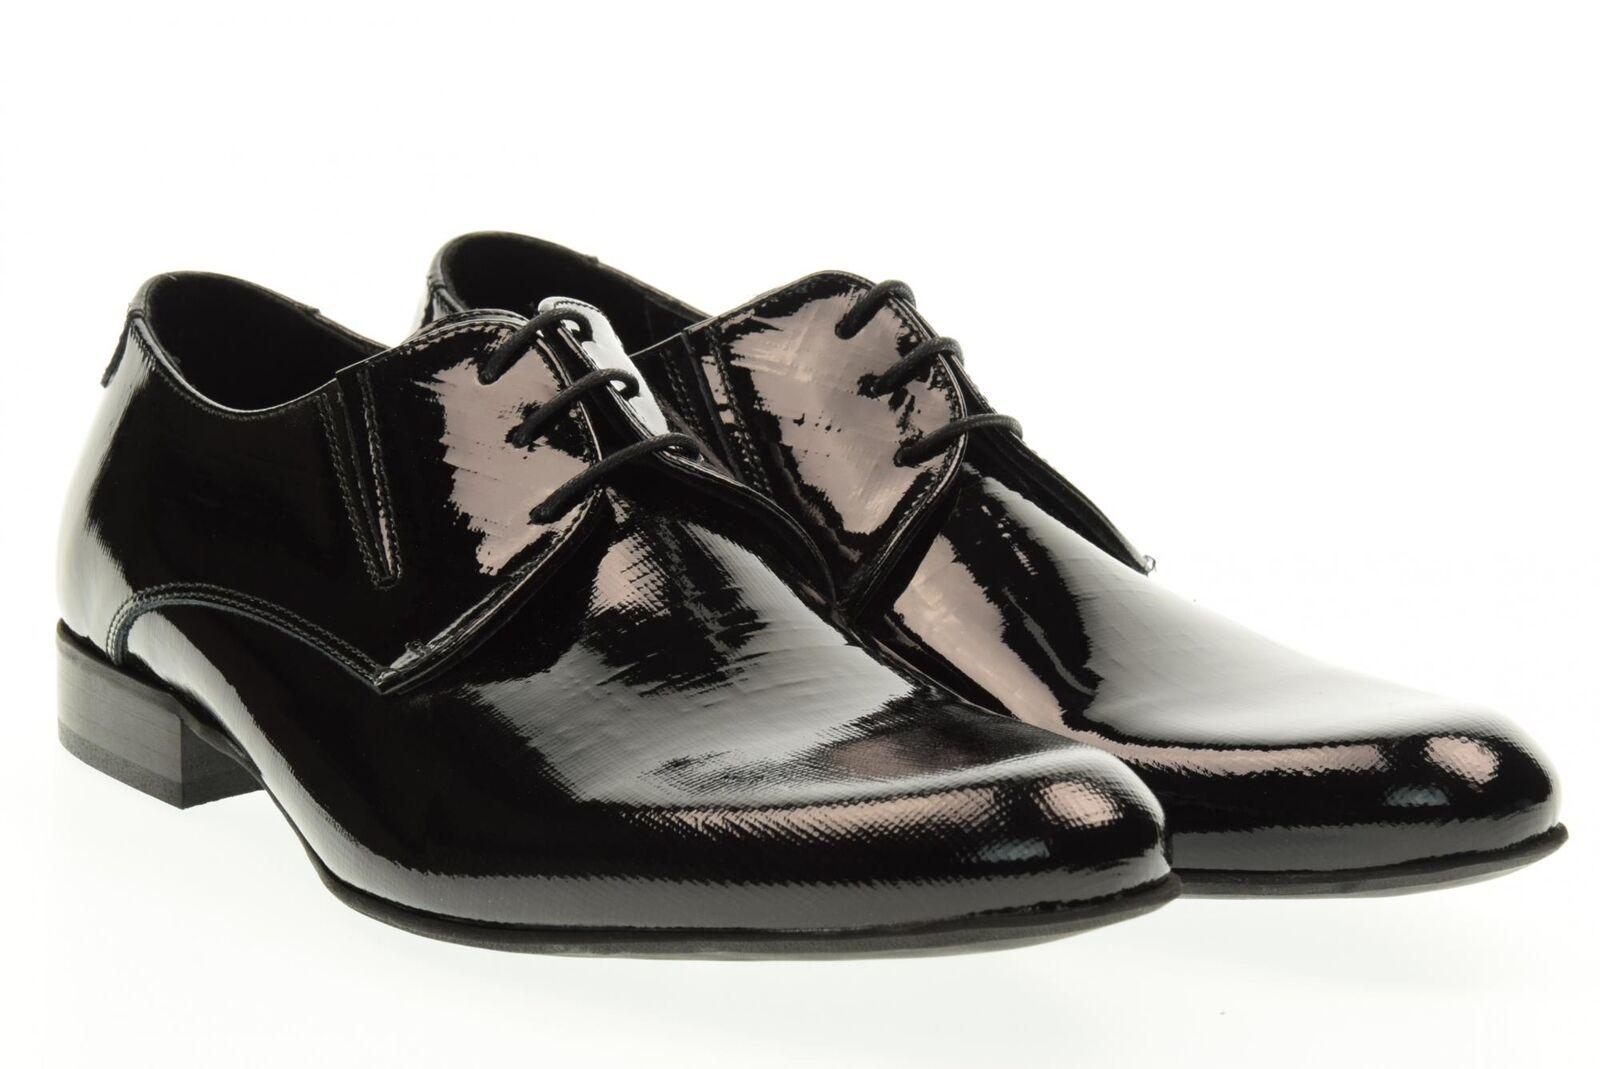 Eveet P17f zapatos homme dentelle 16510